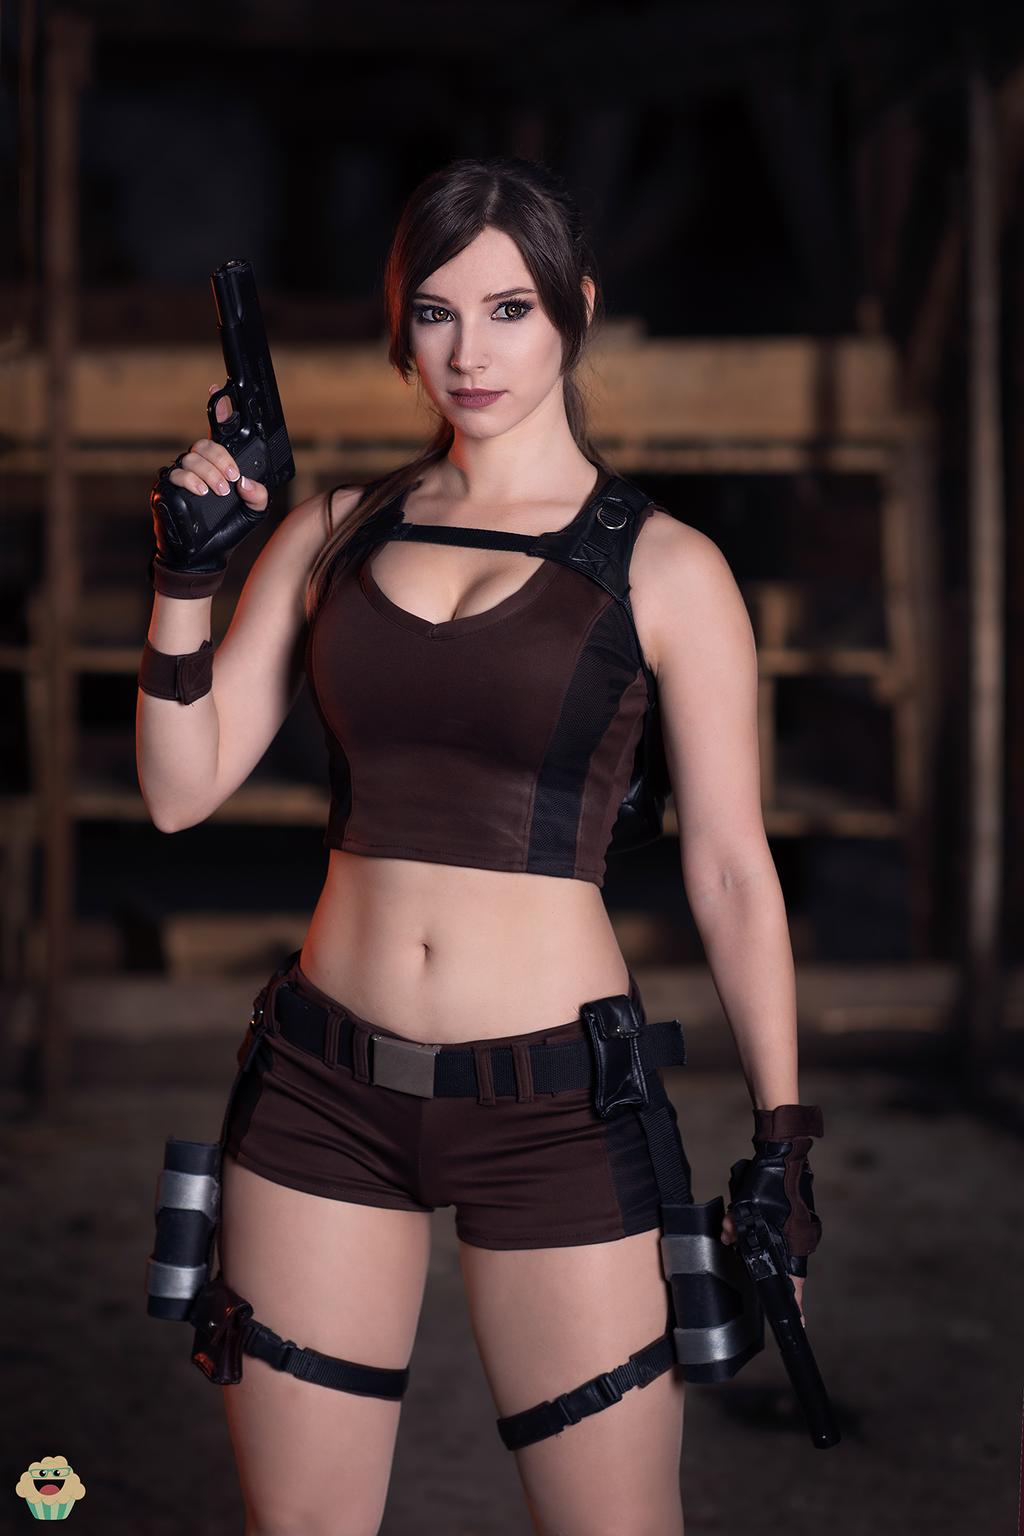 Lara Croft - Tomb Raider cosplay II. by EnjiNight